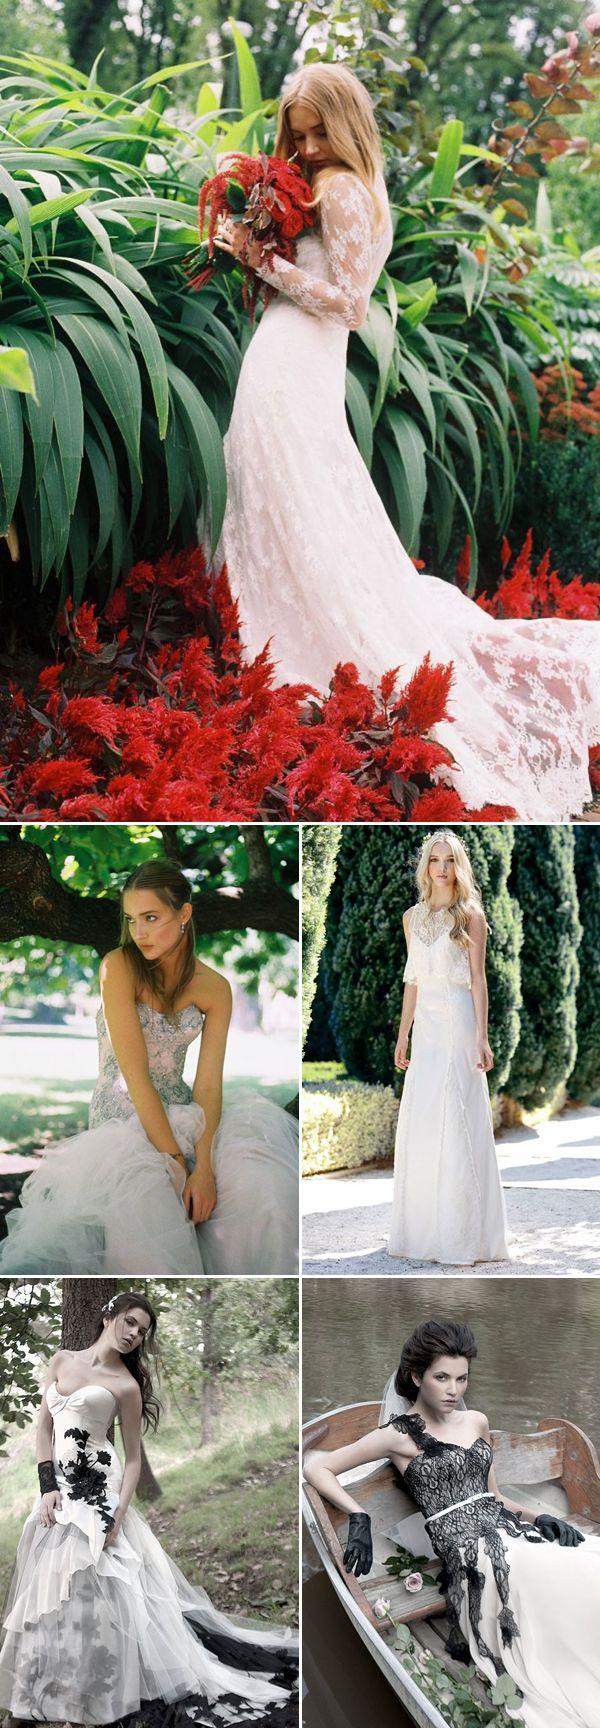 Top 10 Australian Wedding Dress Designers We Love!